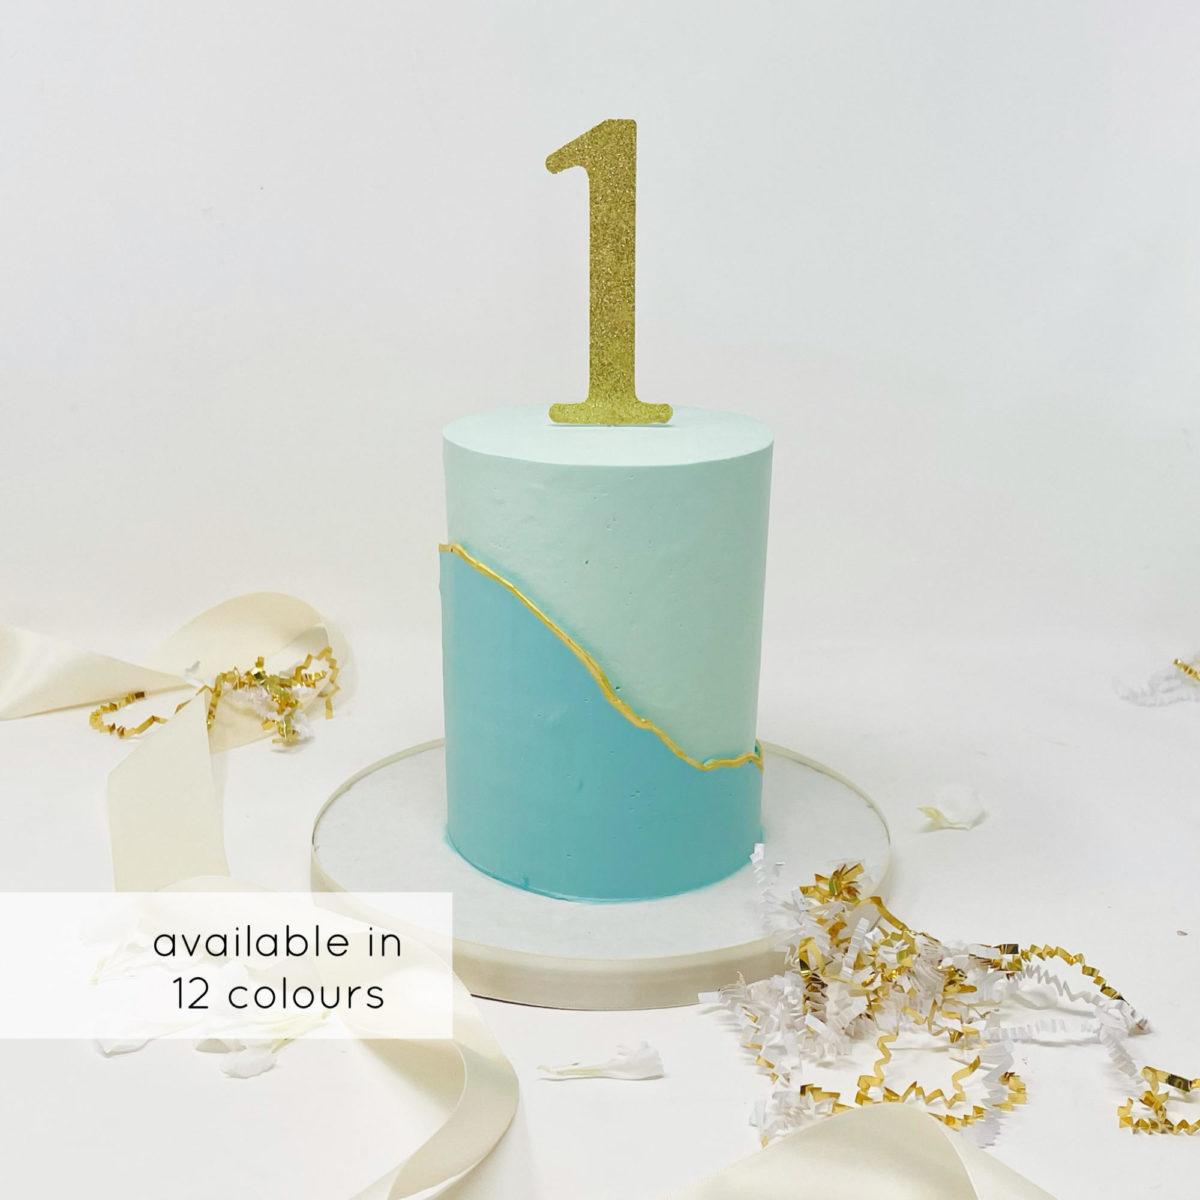 Luxe Monochrome Smash Cake